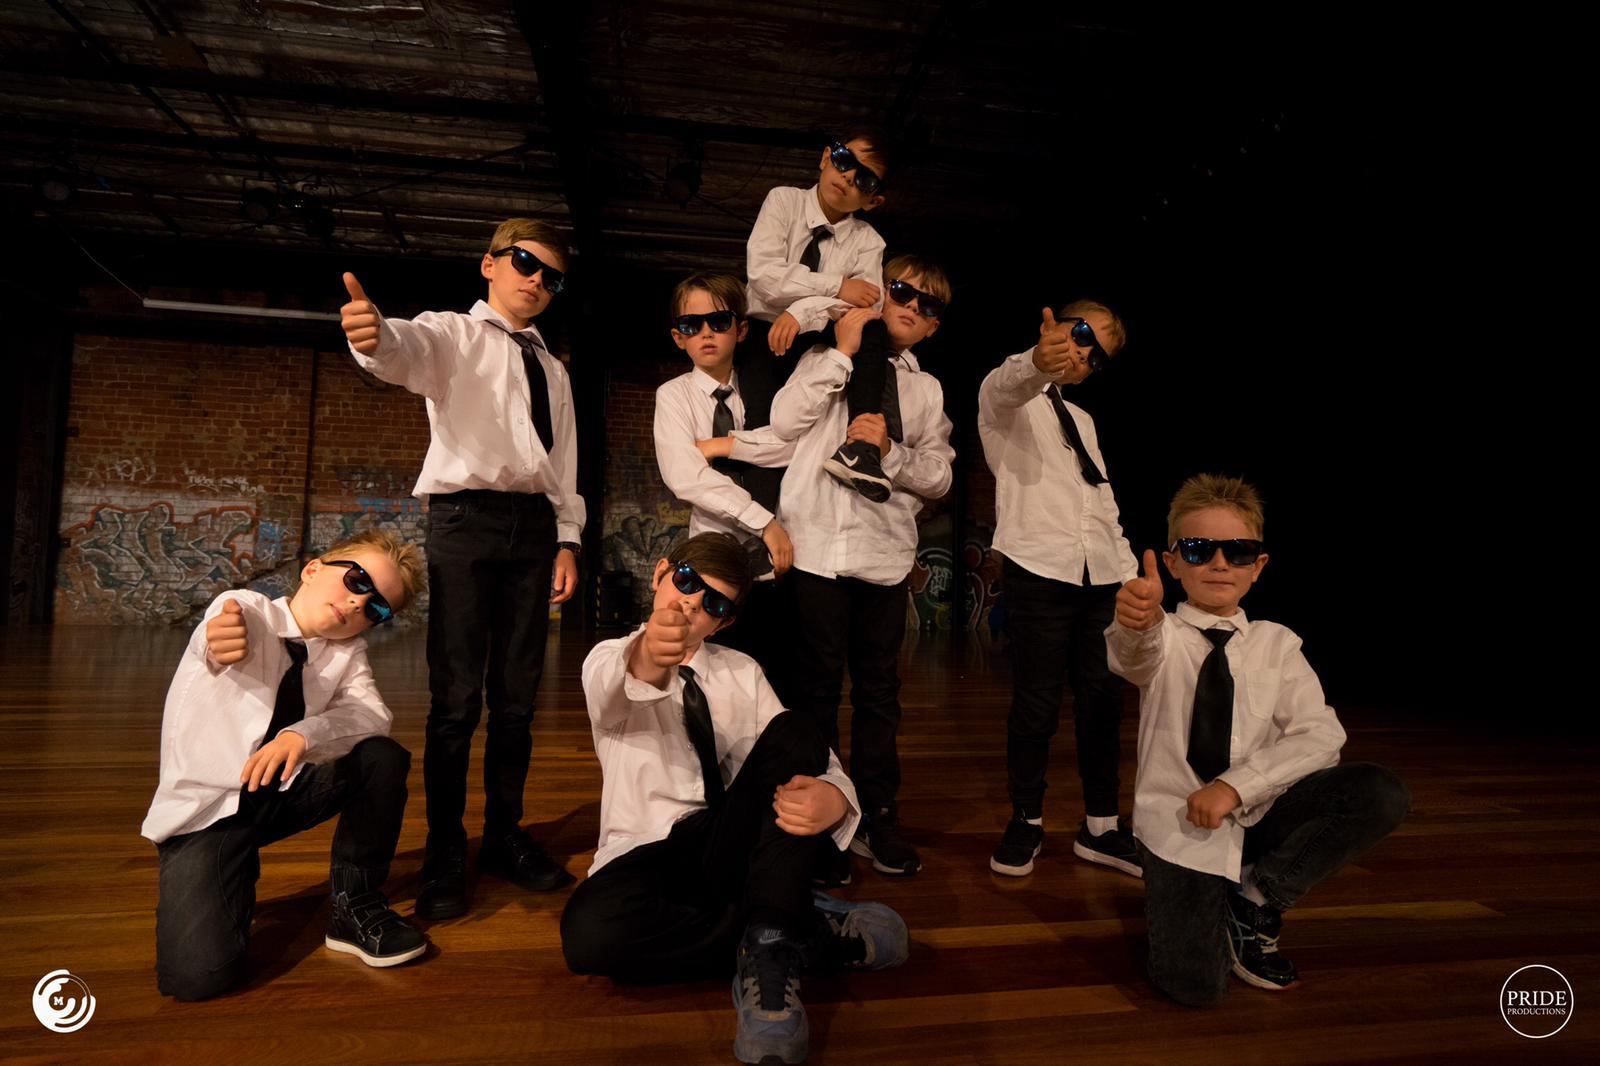 All Boys Hip Hop classes